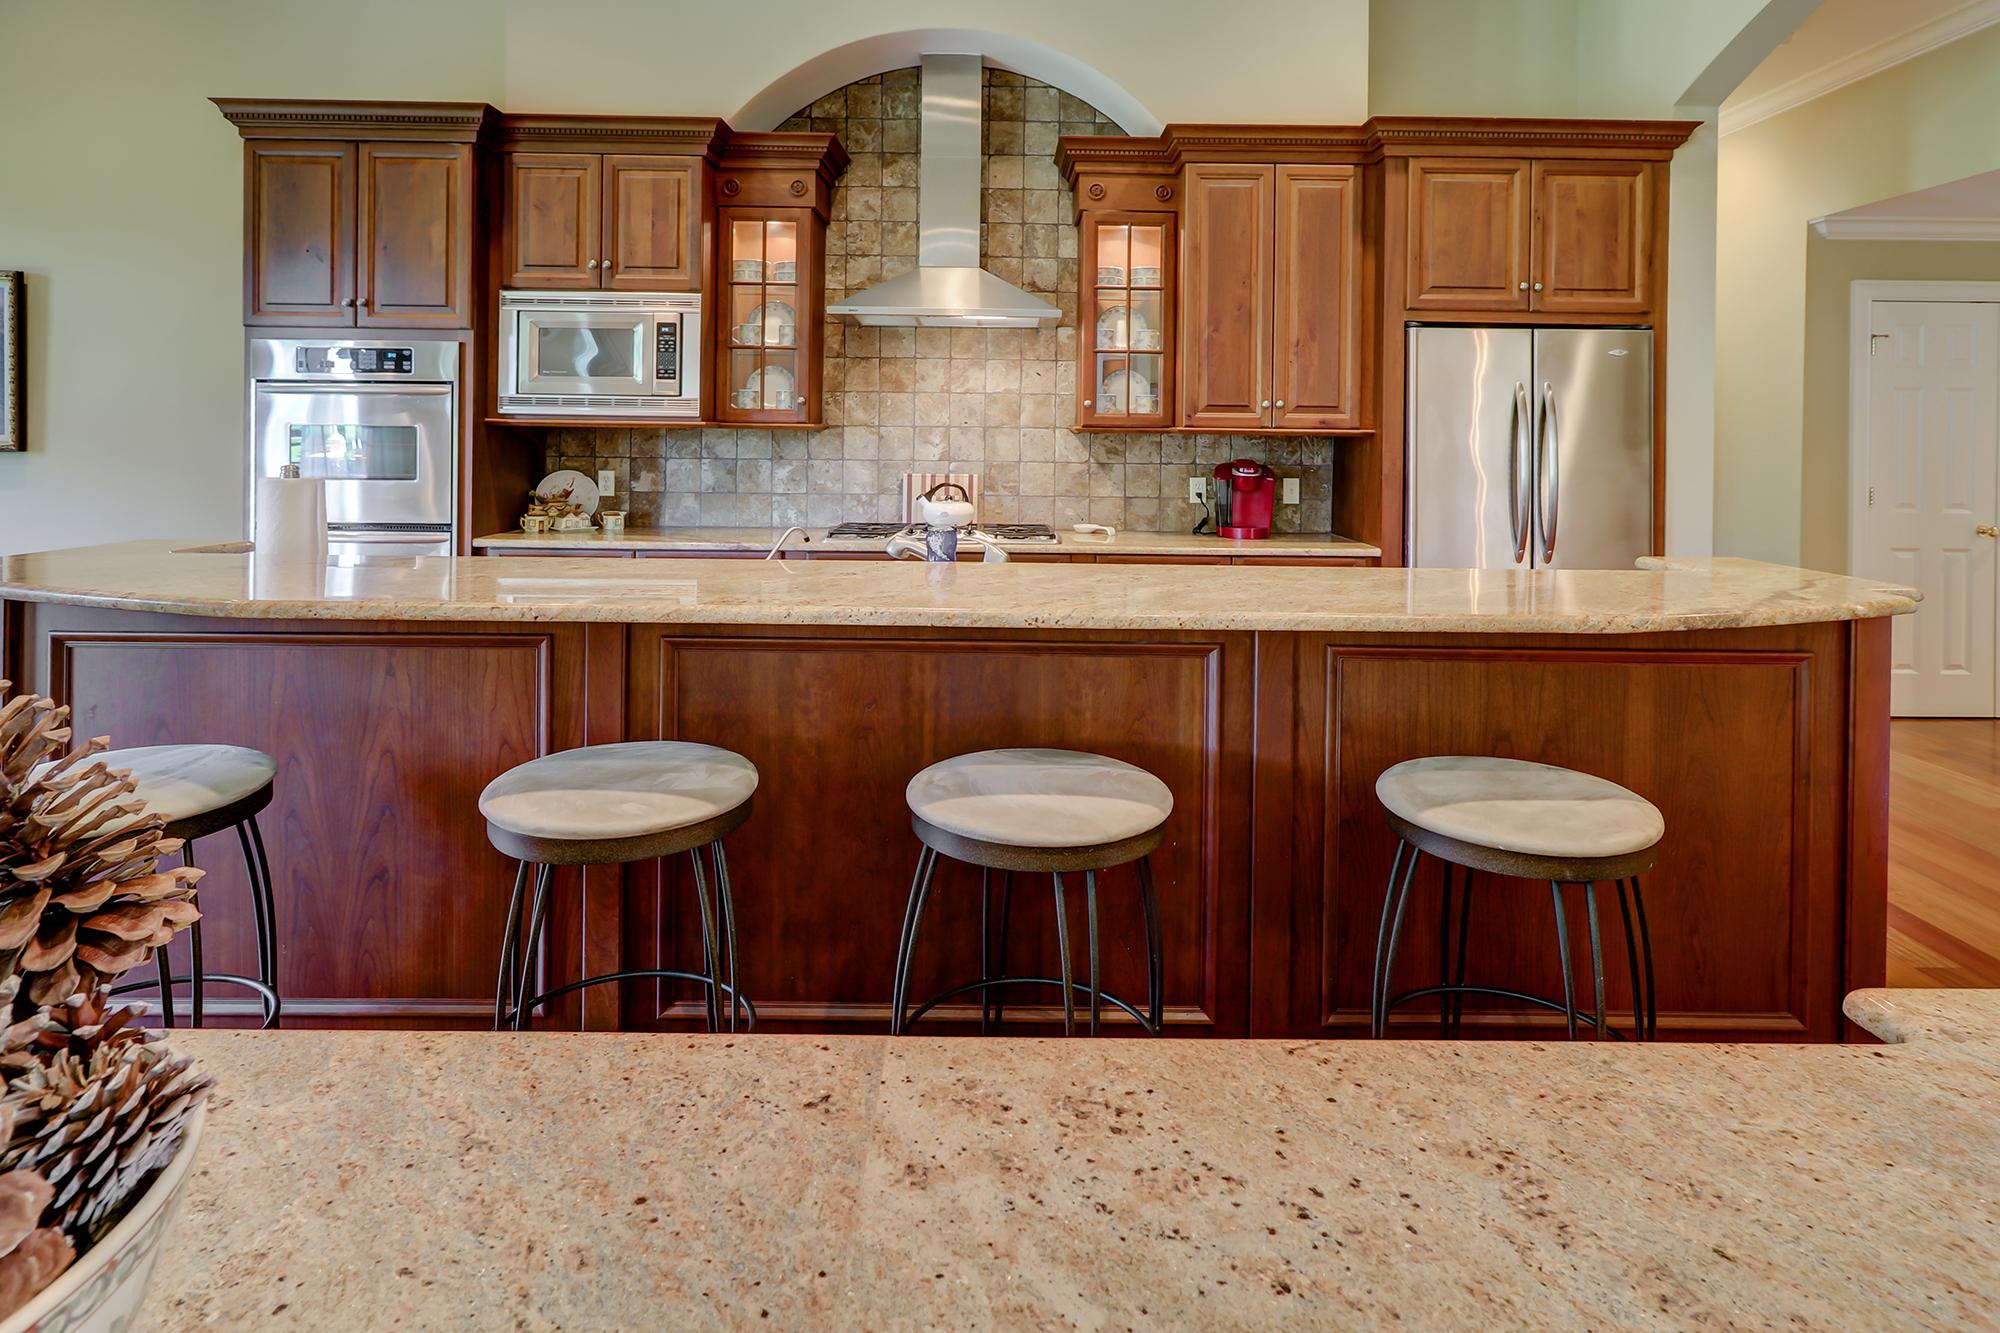 Gourmet Kitchen in an Open Floor Plan on Hilton Head Island